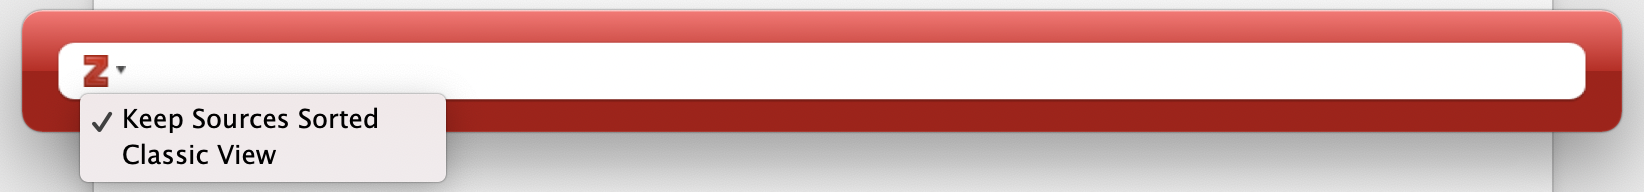 Add/Edit Citation pop-up window